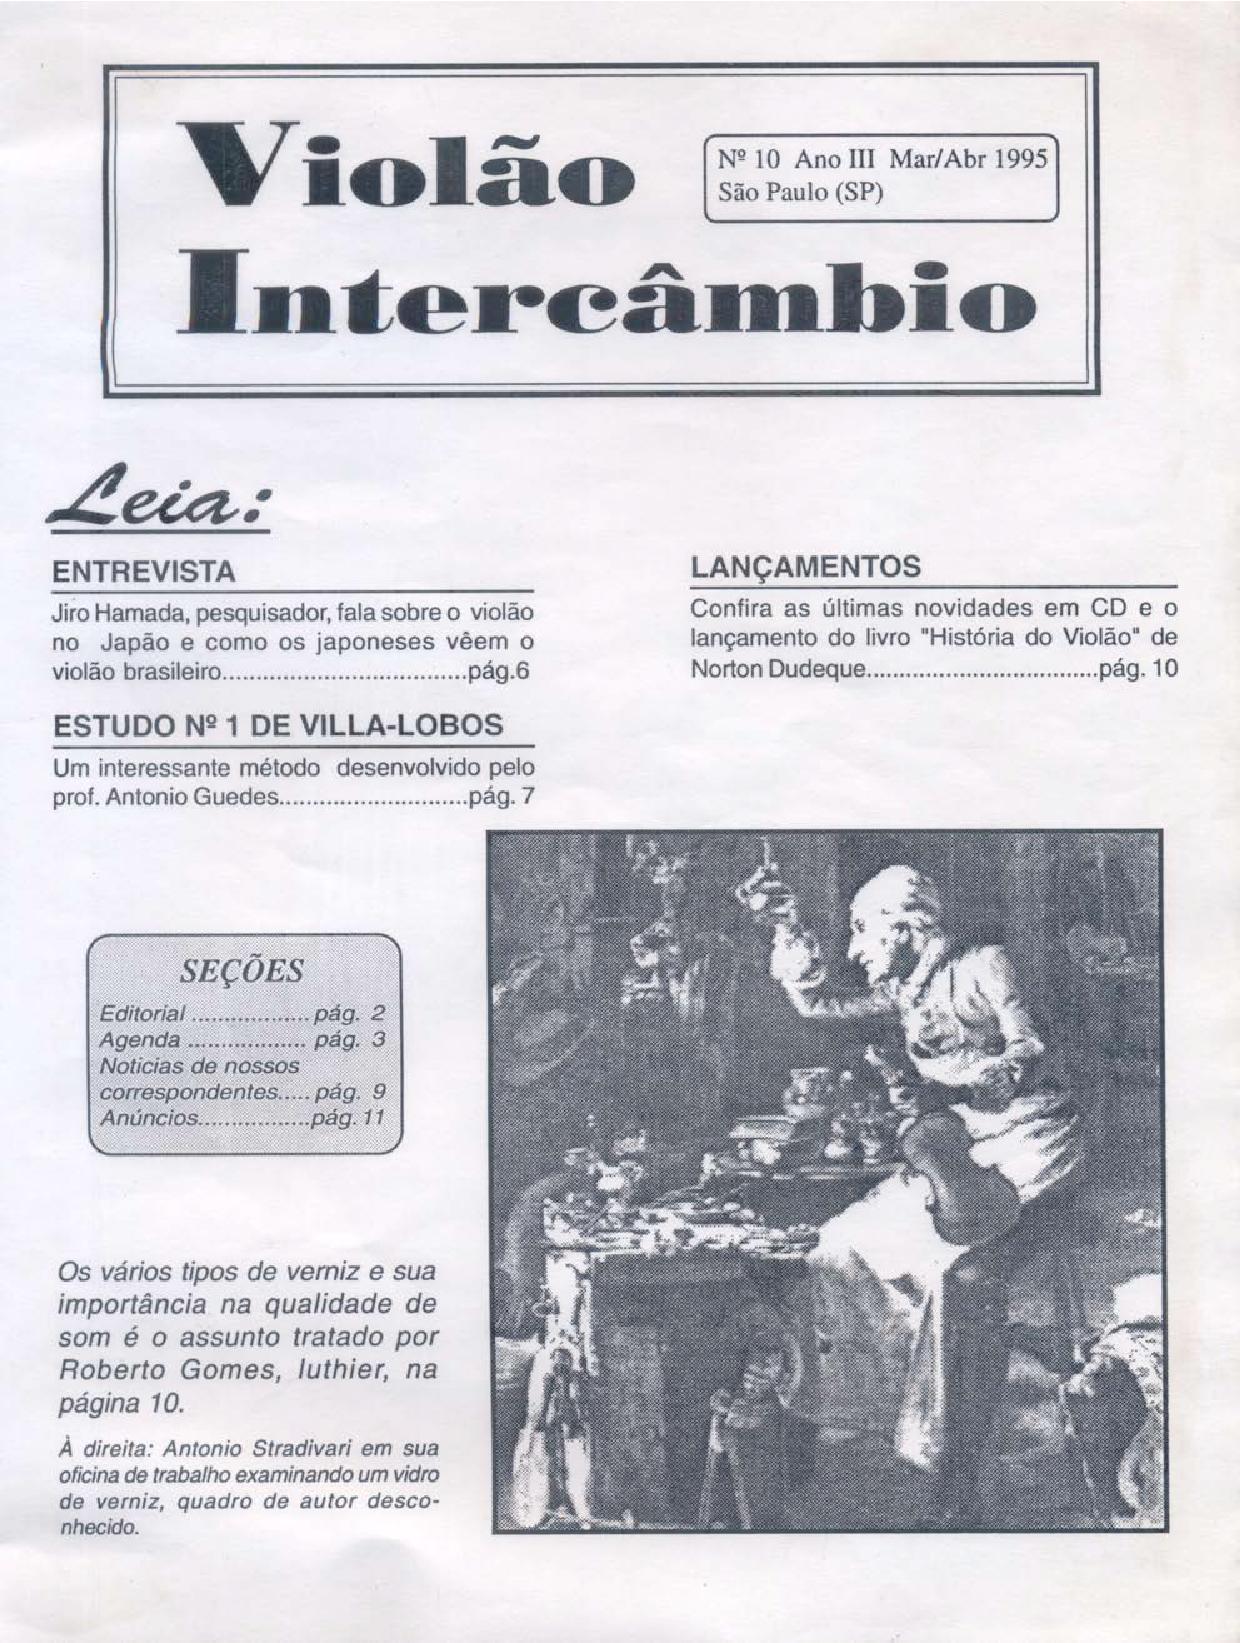 Revista Violão Intercâmbio - n 10 ano III - mar/abr 1995